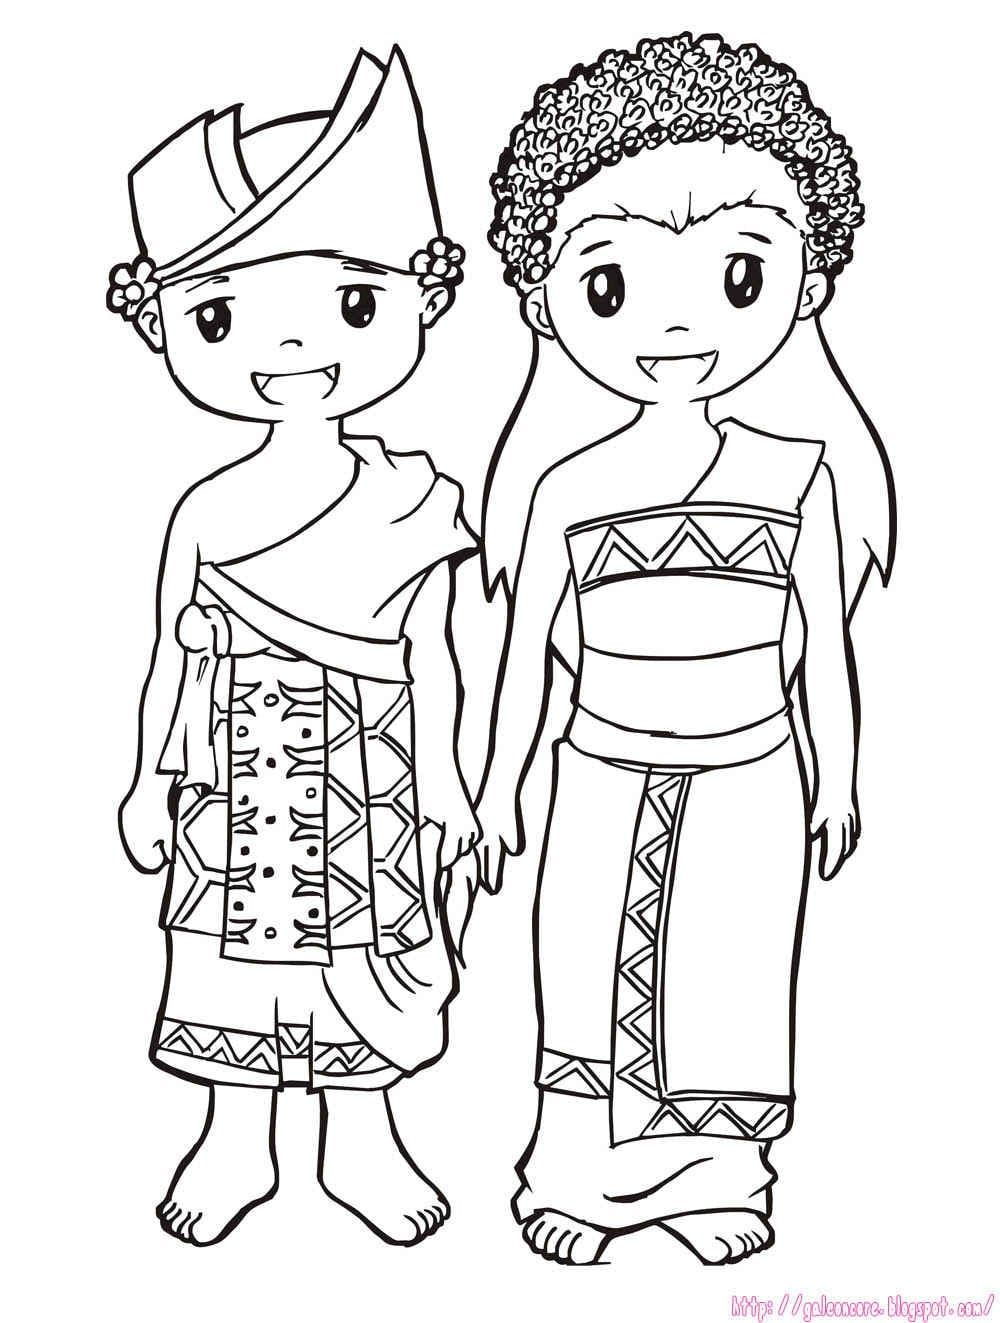 155 Gambar Mewarnai Pakaian Adat Jawa Barat 2018 Dan Baju